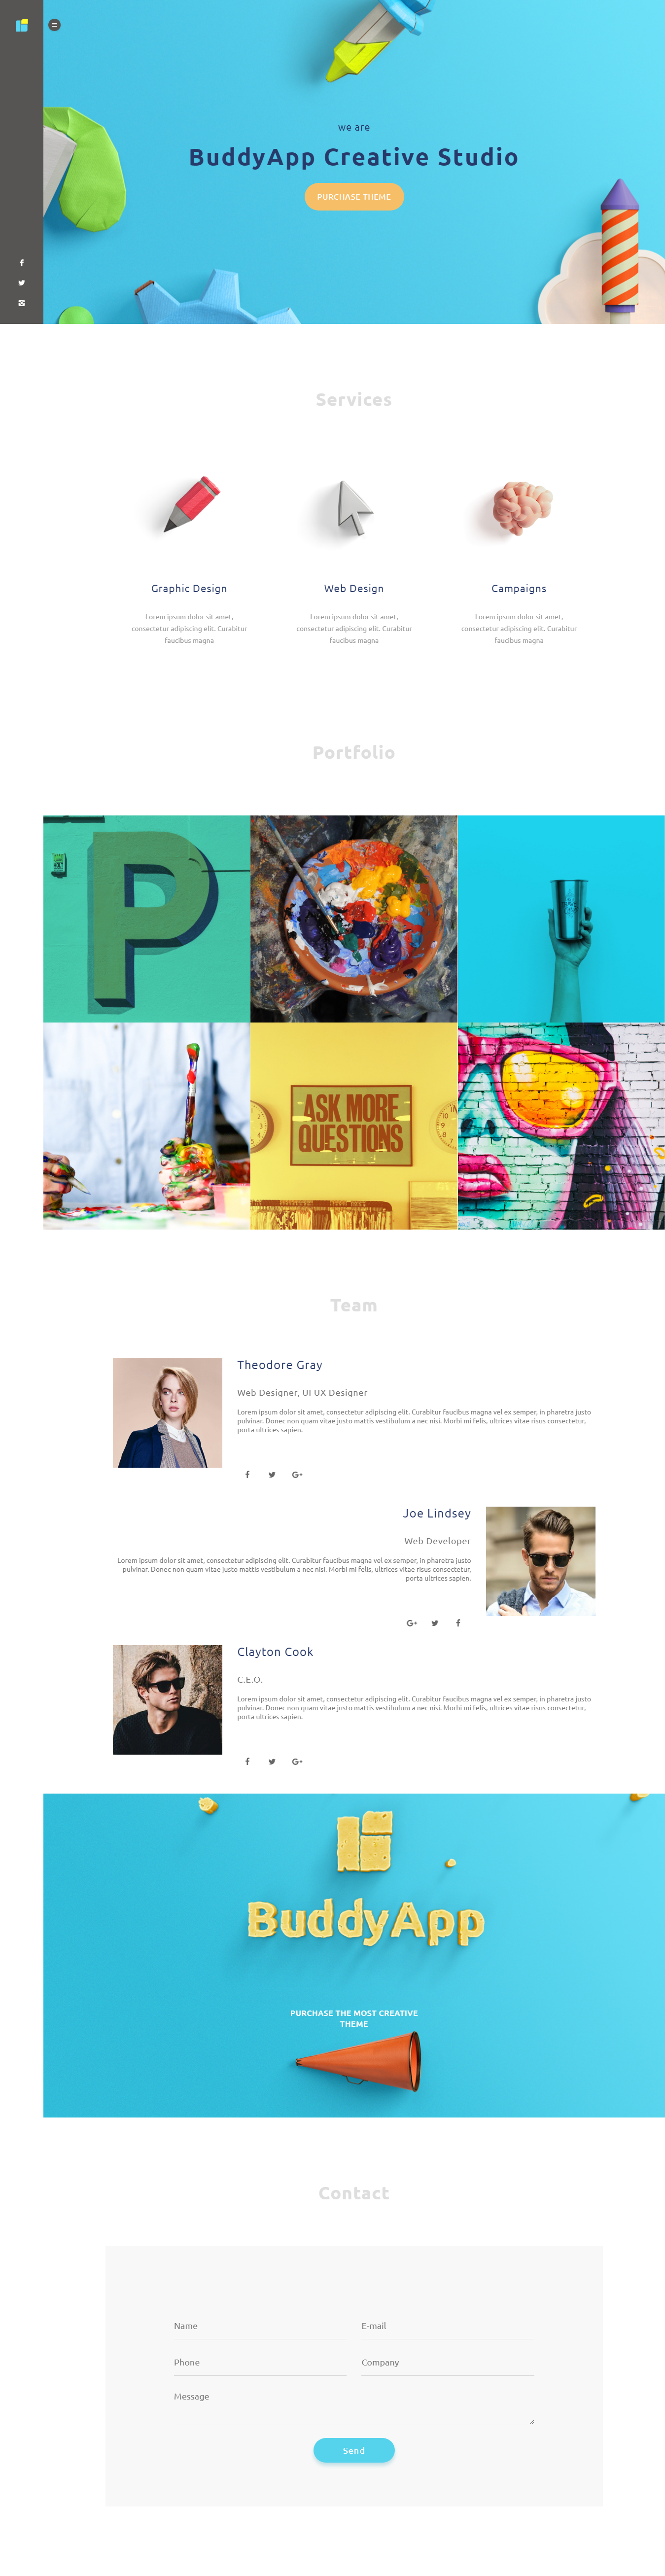 buddyapp best premium mobile app wordpress theme - 10+ Best Premium Mobile App WordPress Themes